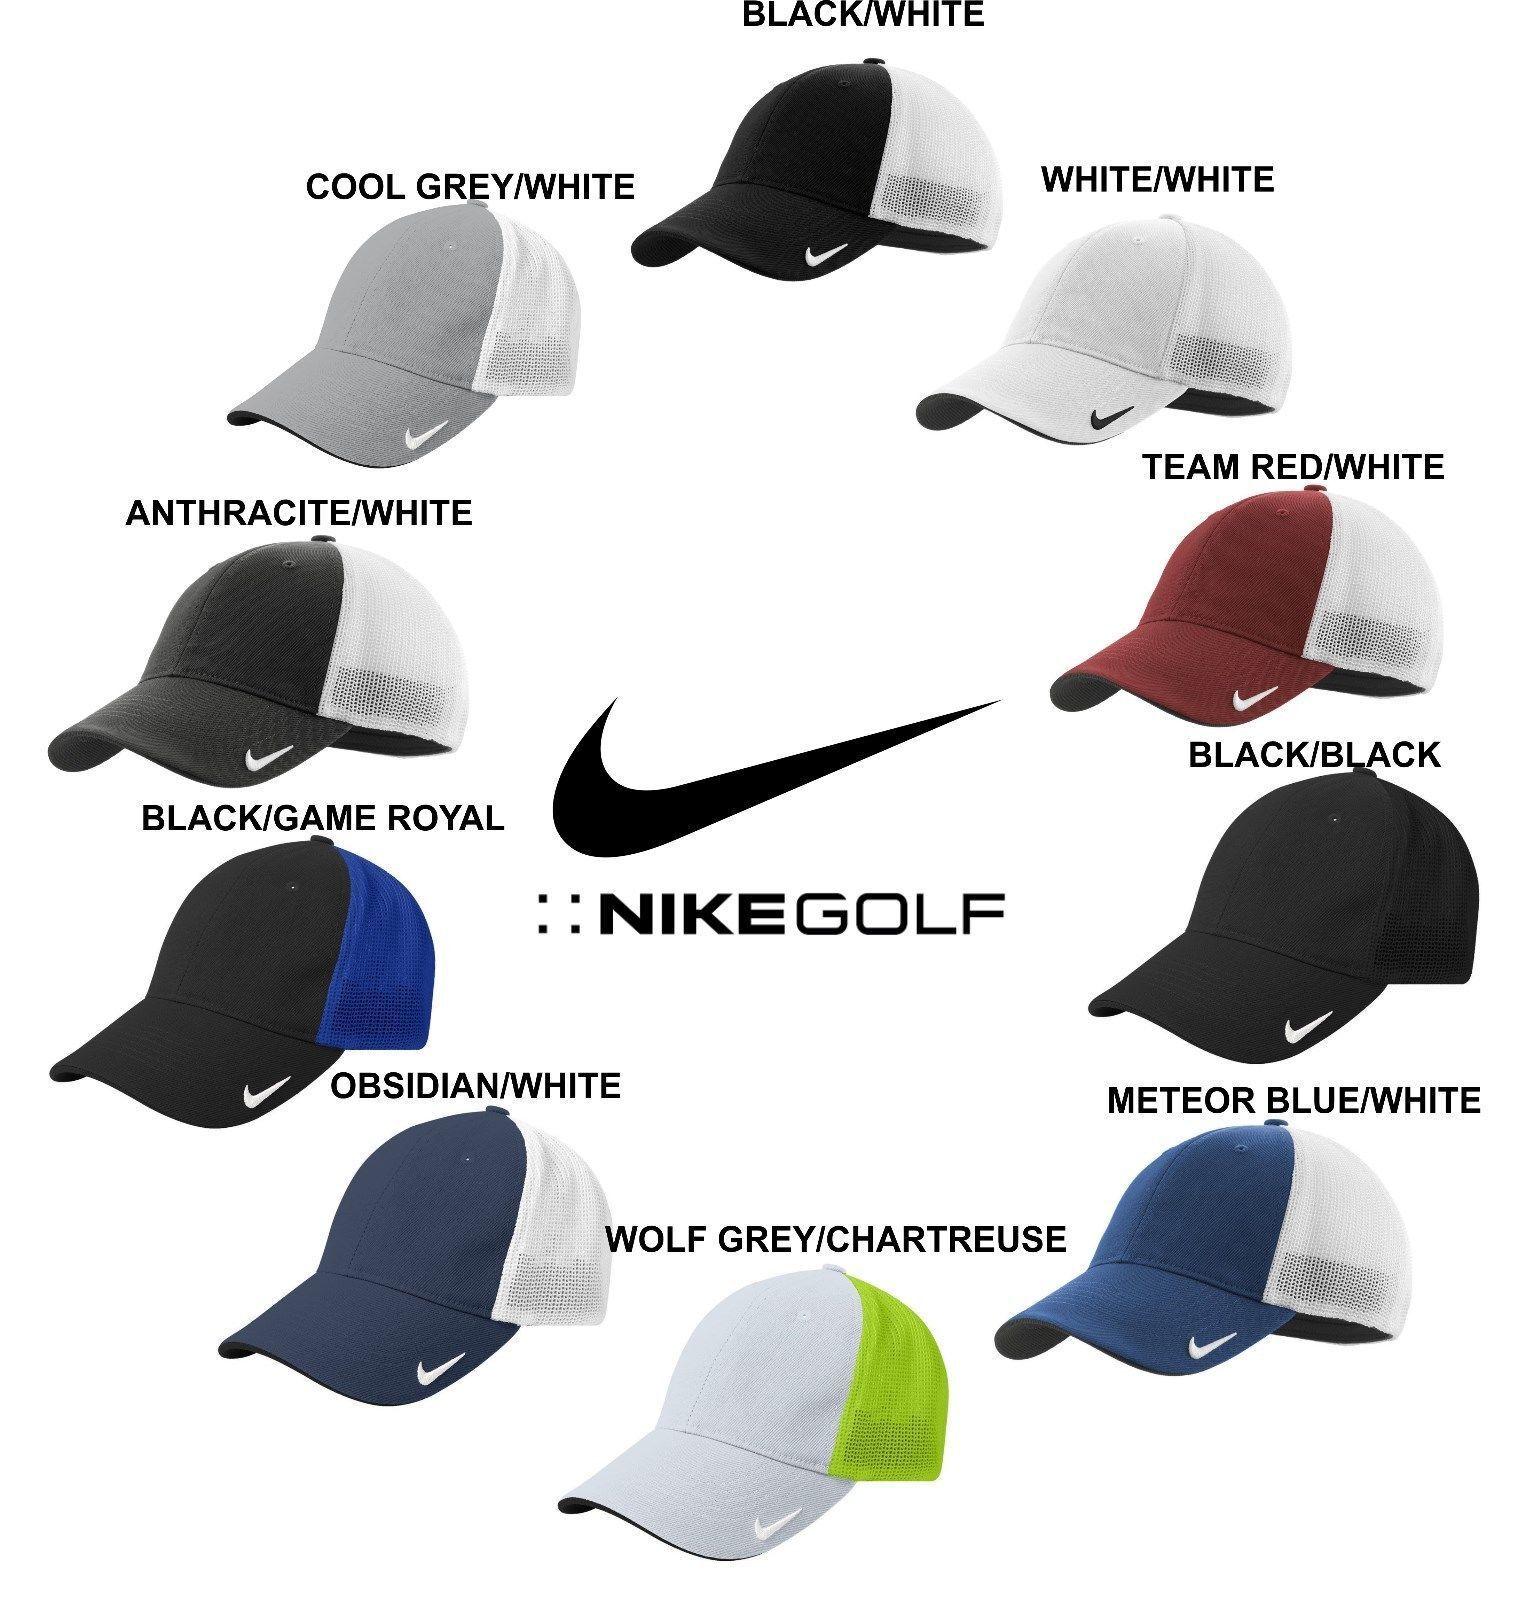 48b7af0d Details about Nike Golf FITTED Swoosh FLEX FIT MESH BACK TRUCKER Cap  Structured Baseball Hat